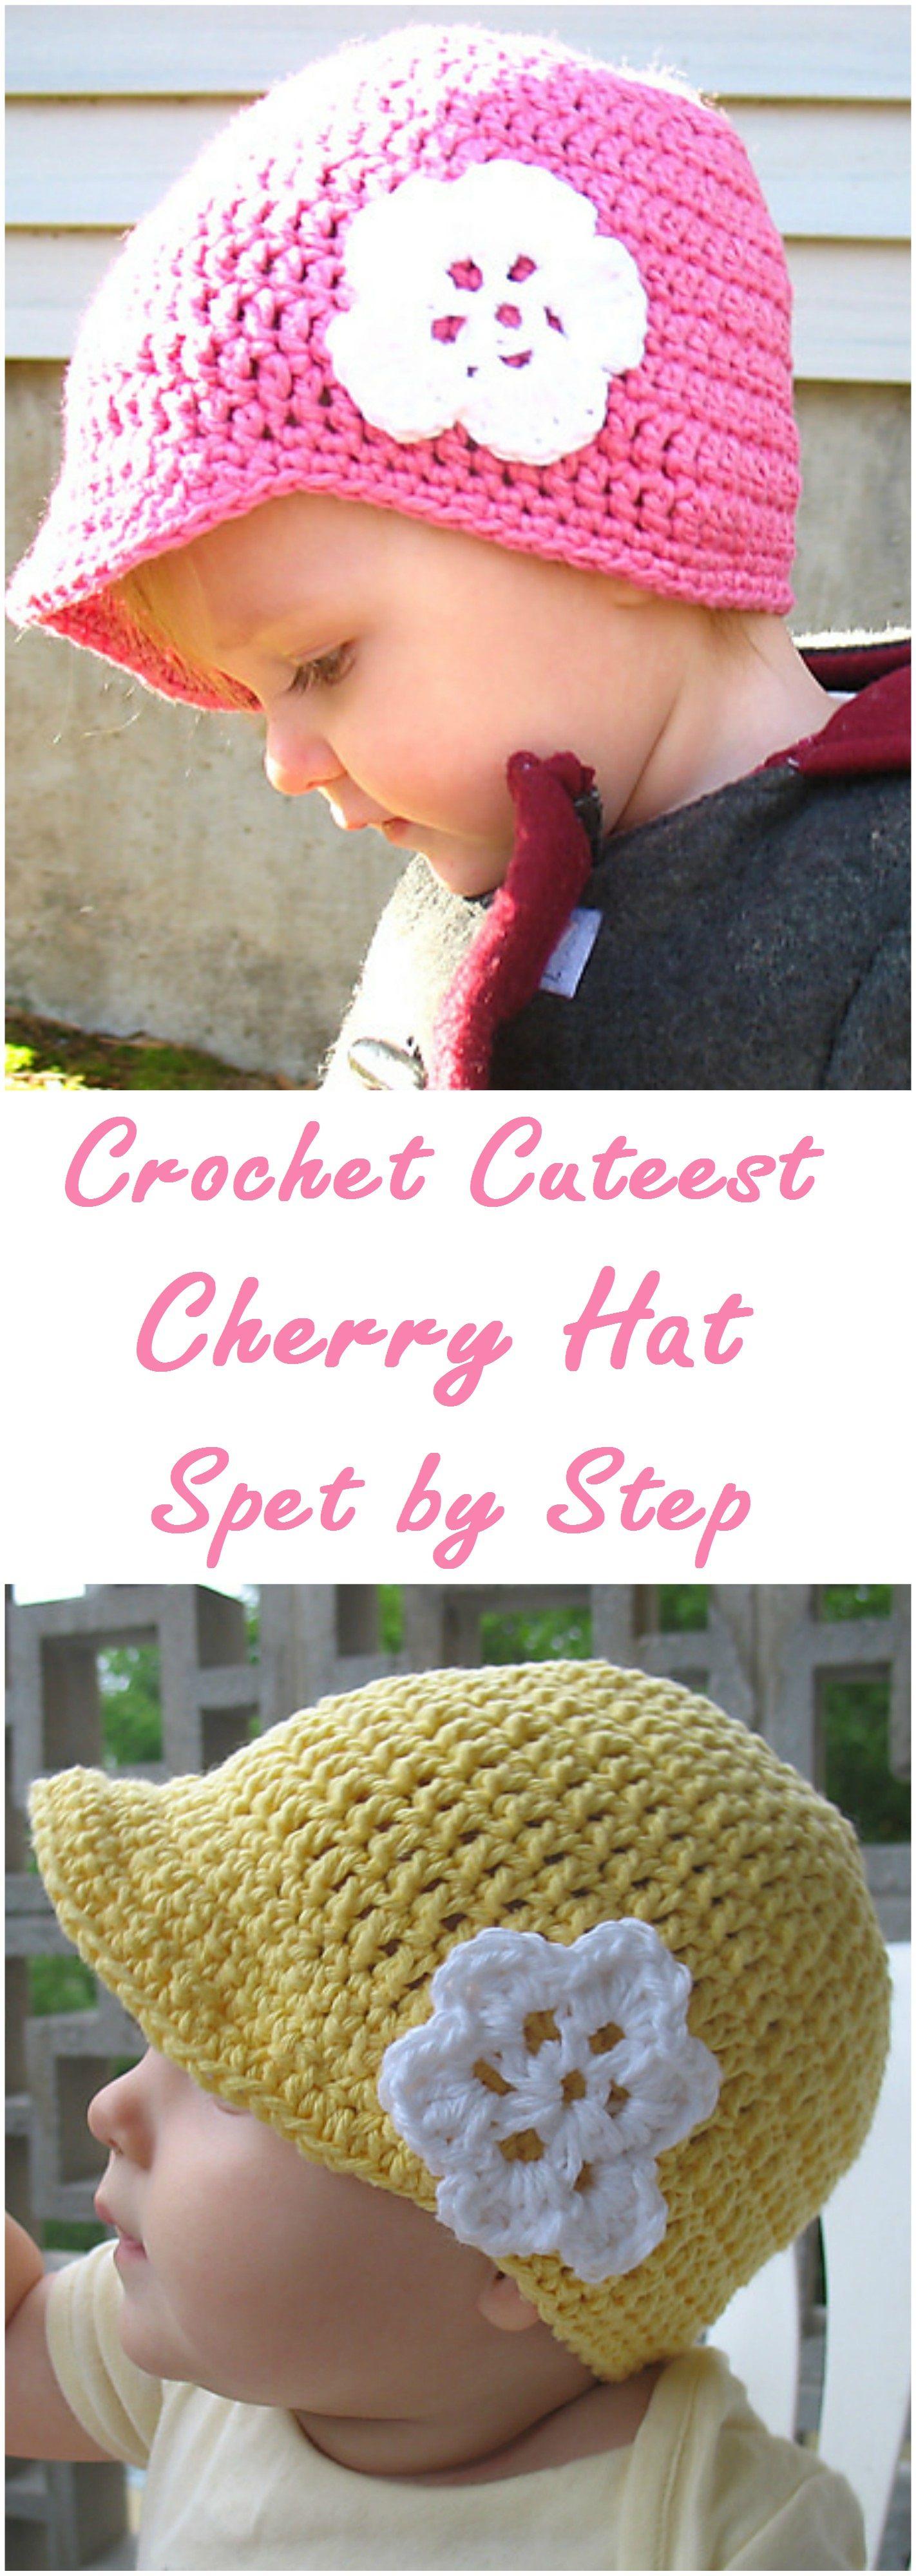 Crochet Cherry Hat | Crochet projects | Pinterest